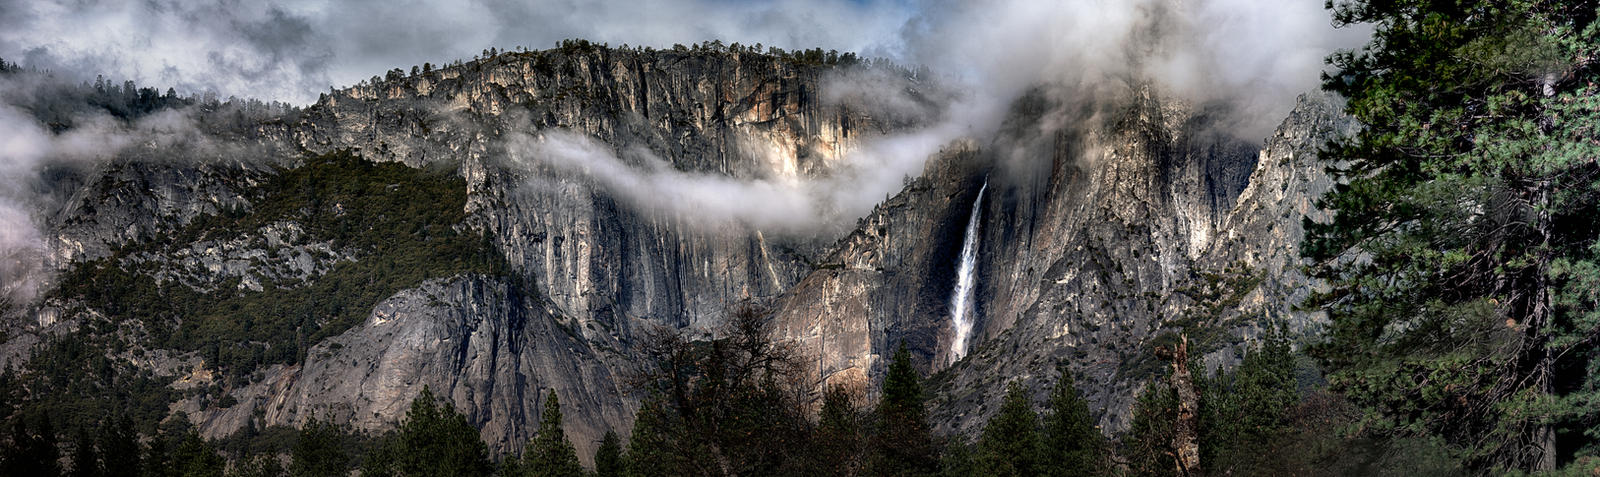 100 Megapixel Yosemite 2014: Yosemite Falls by AugenStudios